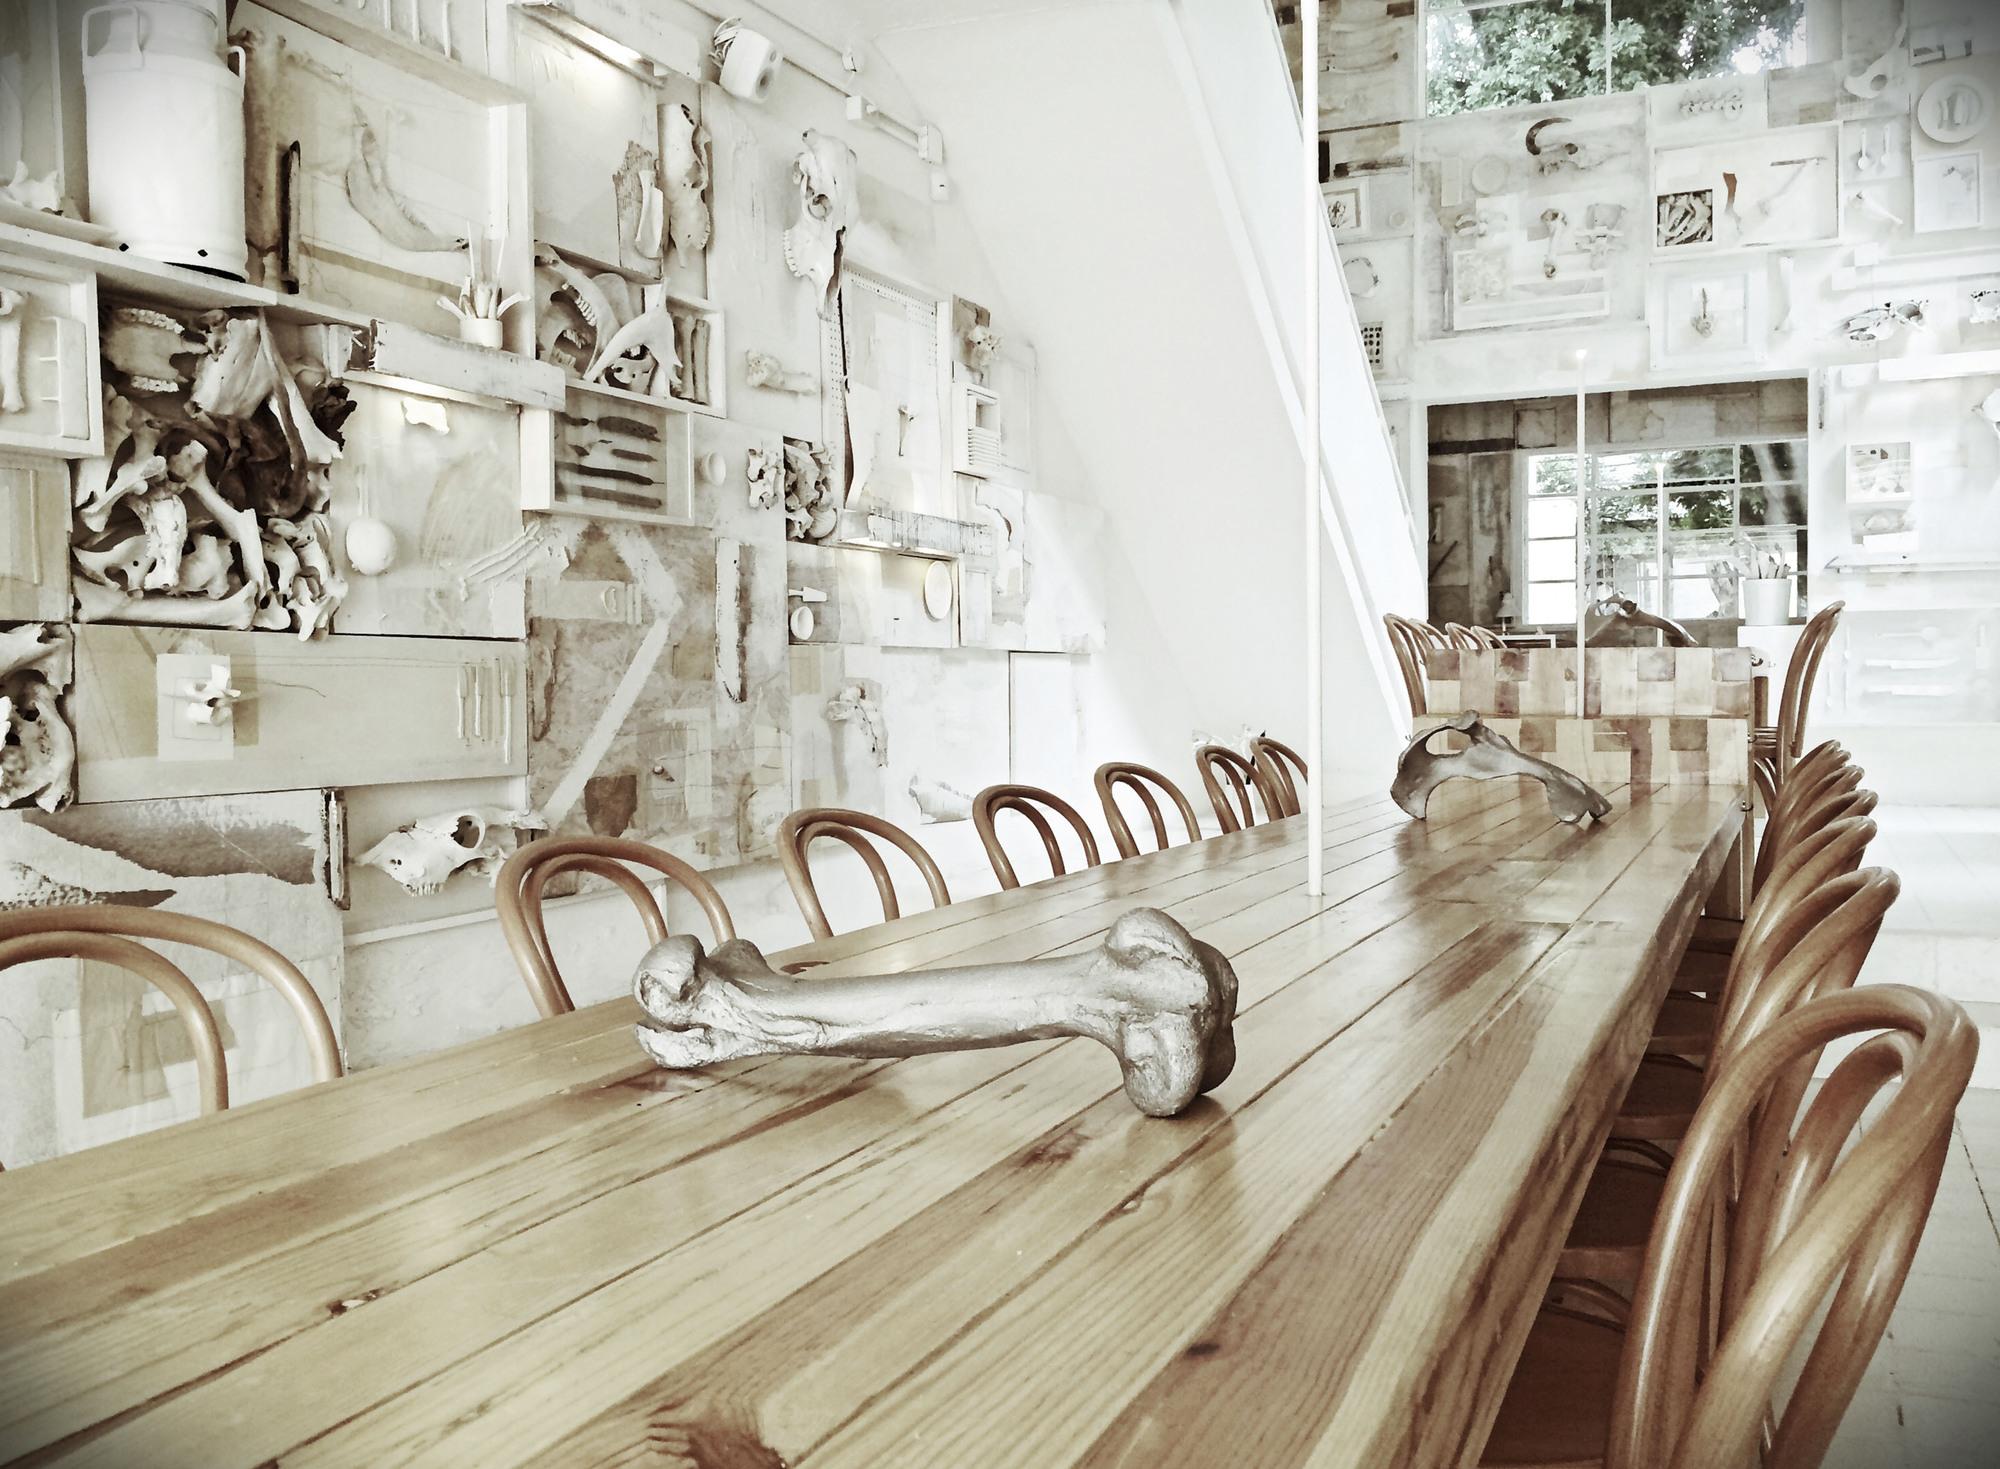 Hueso Restaurant / Cadena Asociados (13)